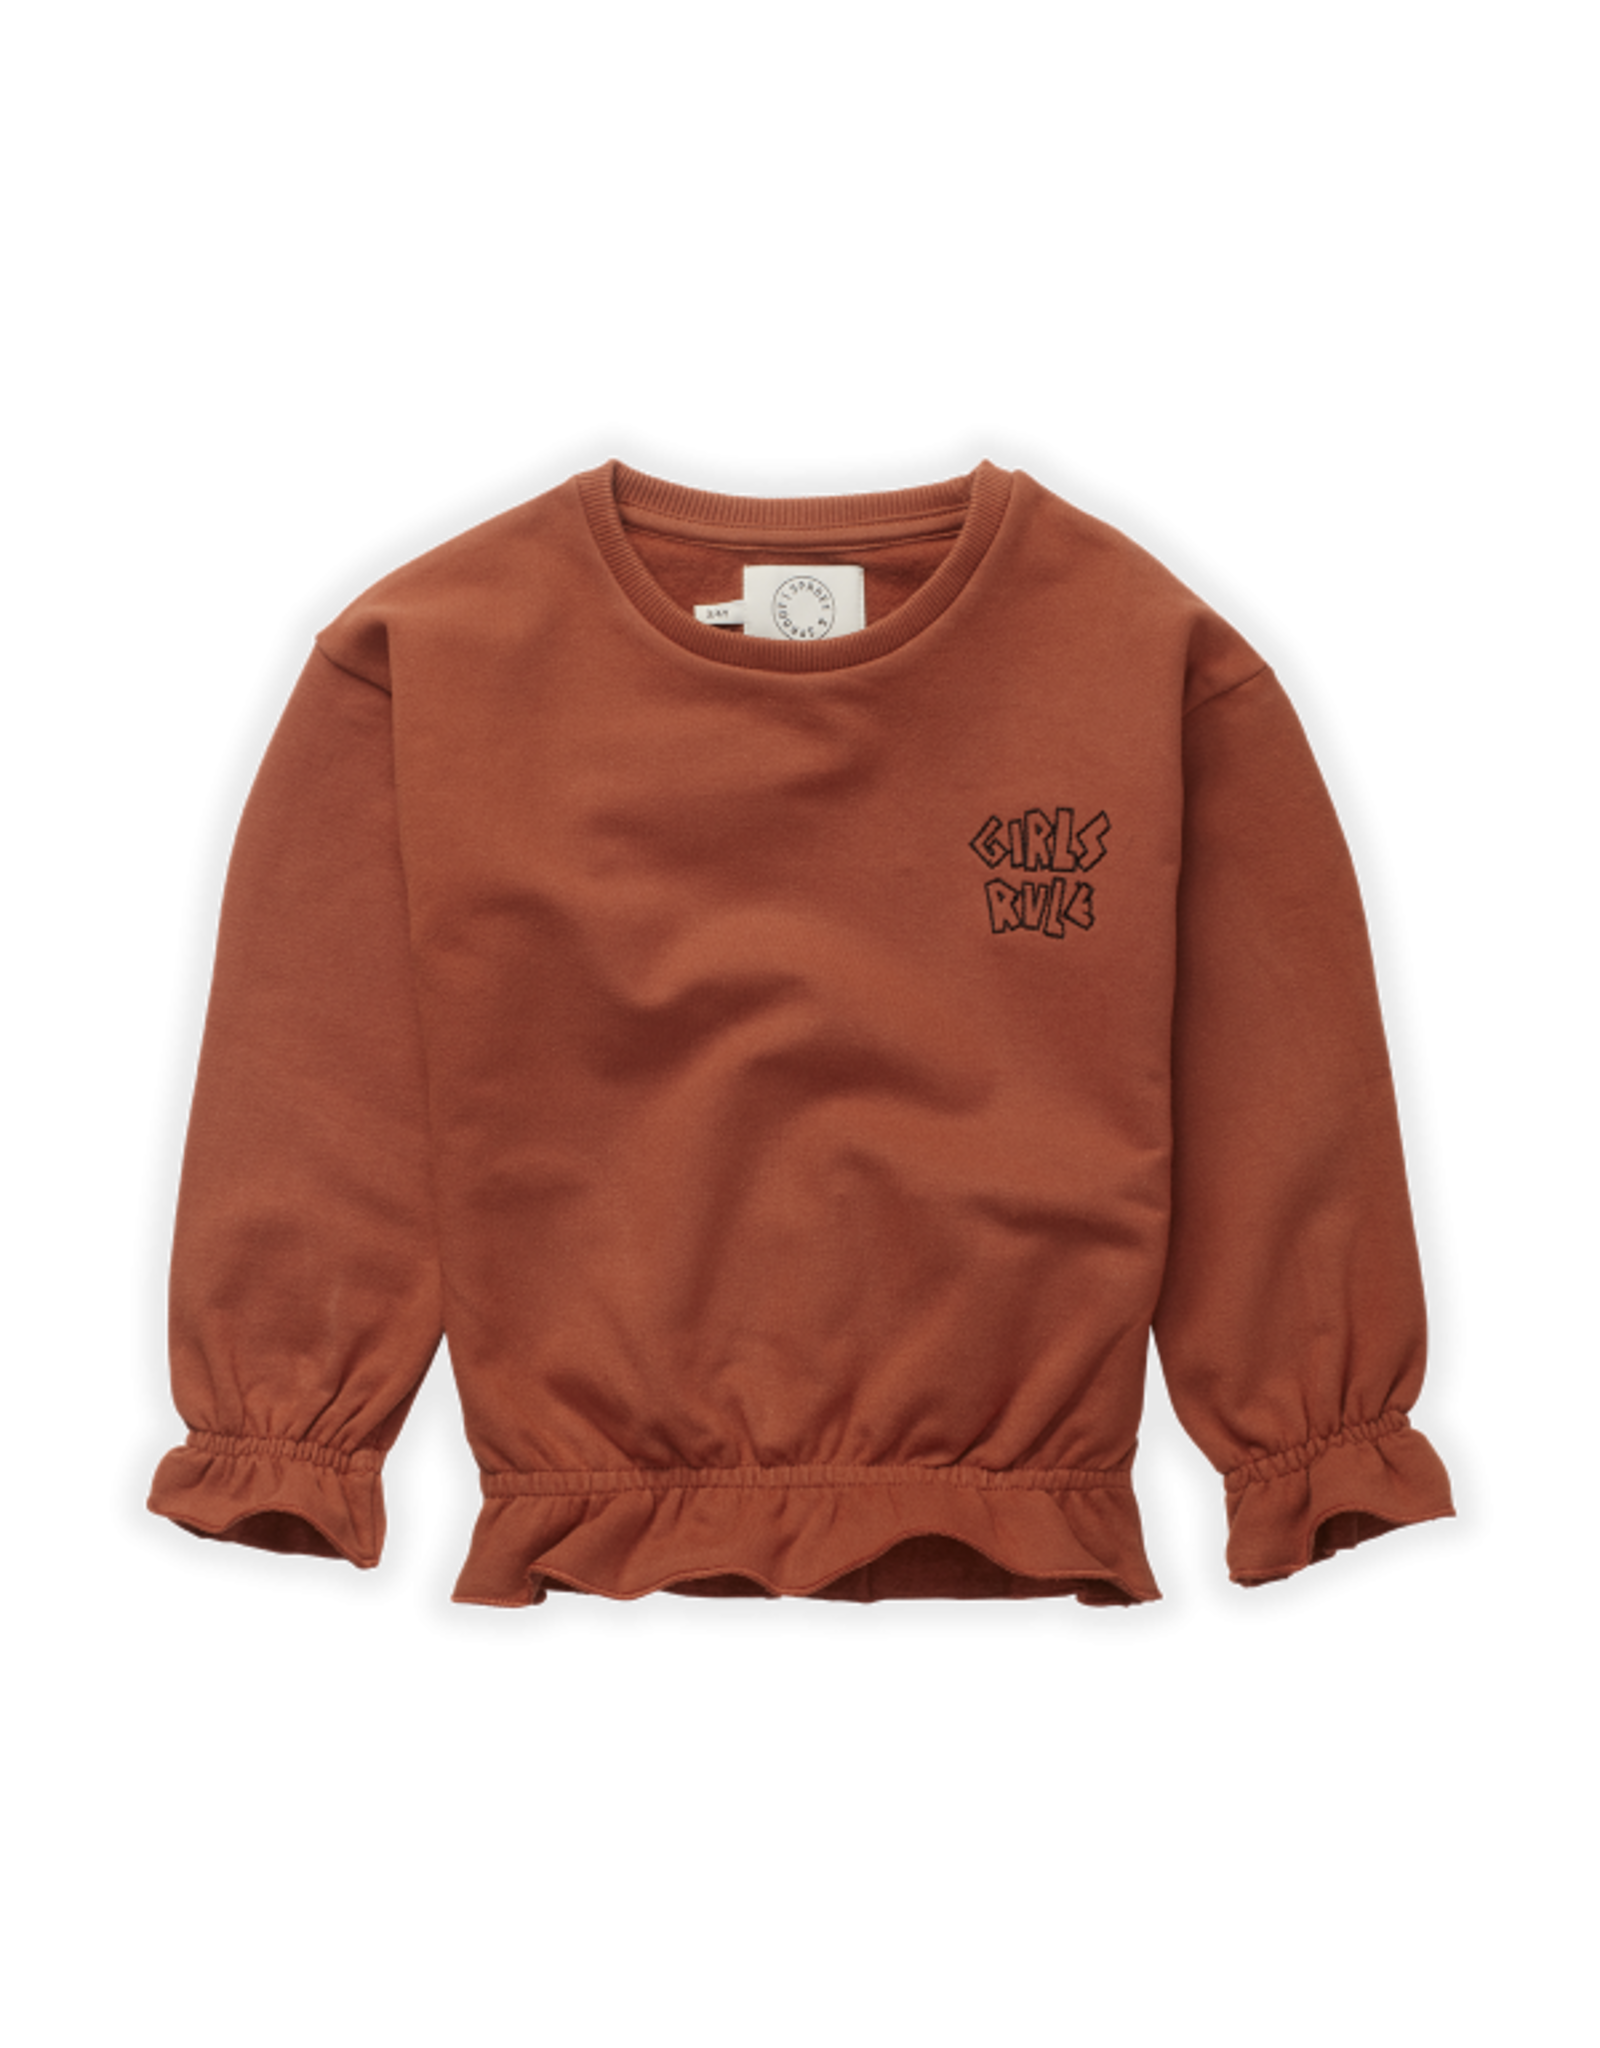 Sproet & Sprout Ruffle Sweatshirt Girls Rule Auburn